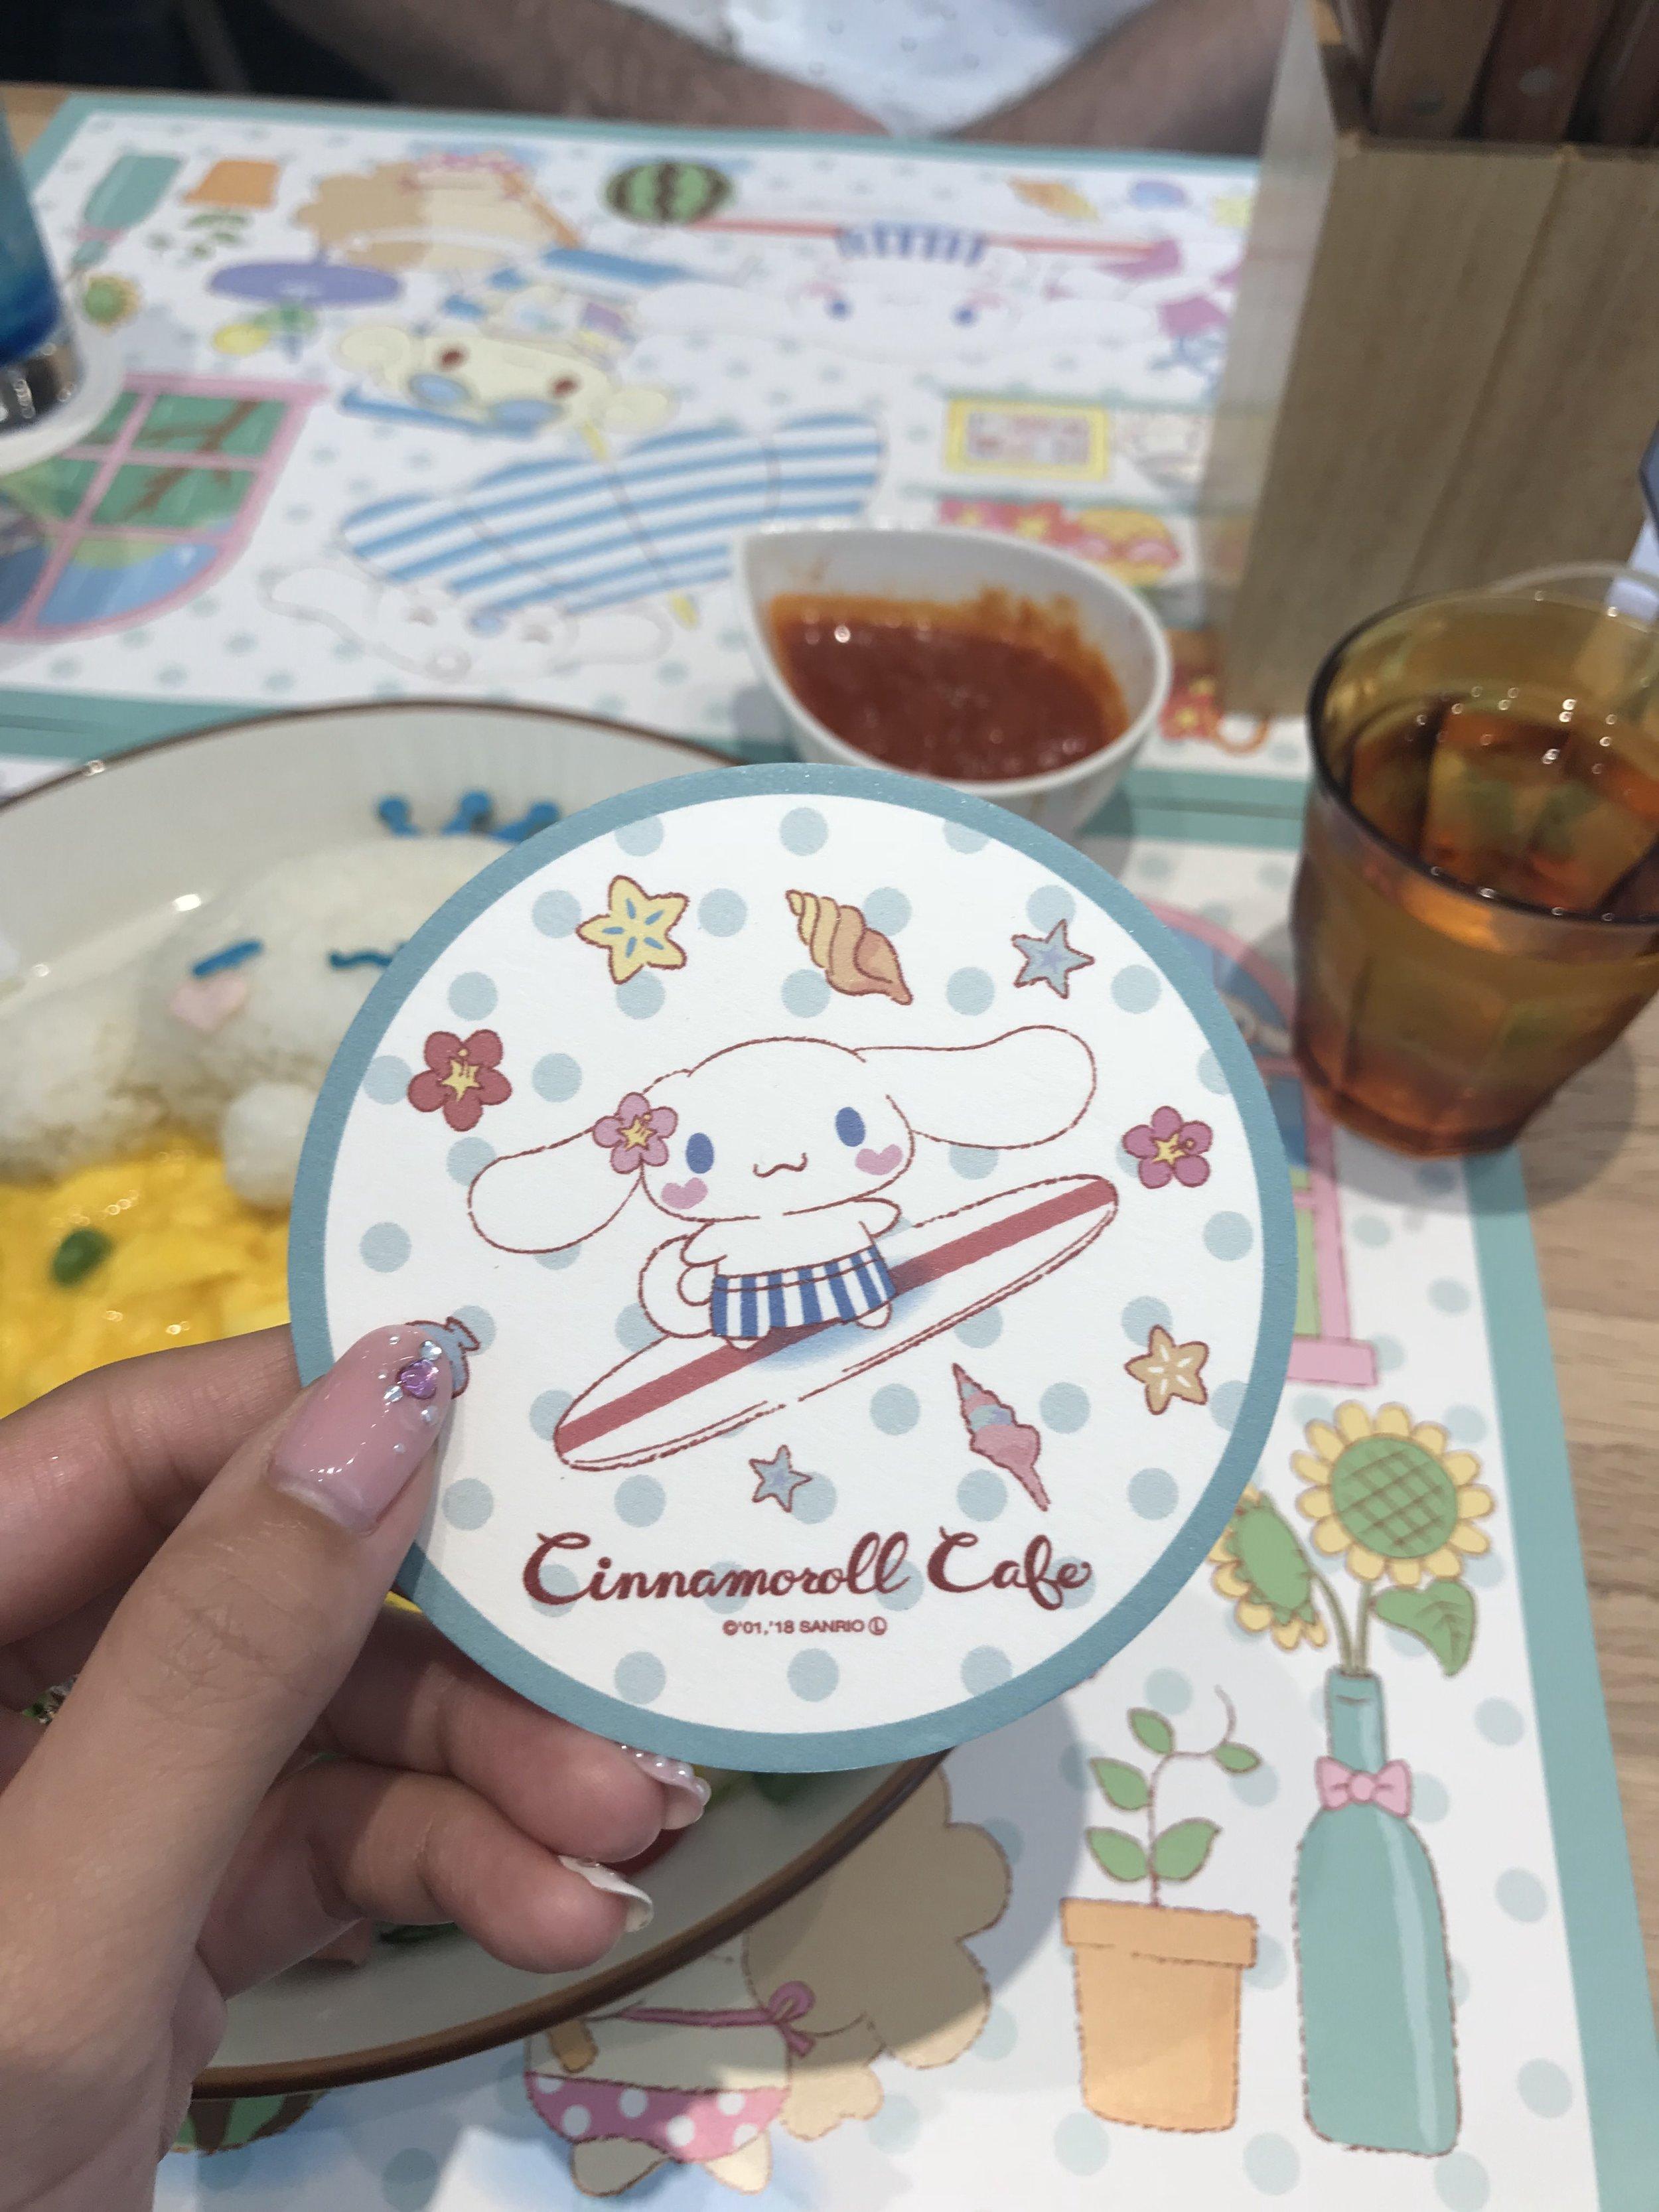 Summer-edition Cinnamoroll coaster!